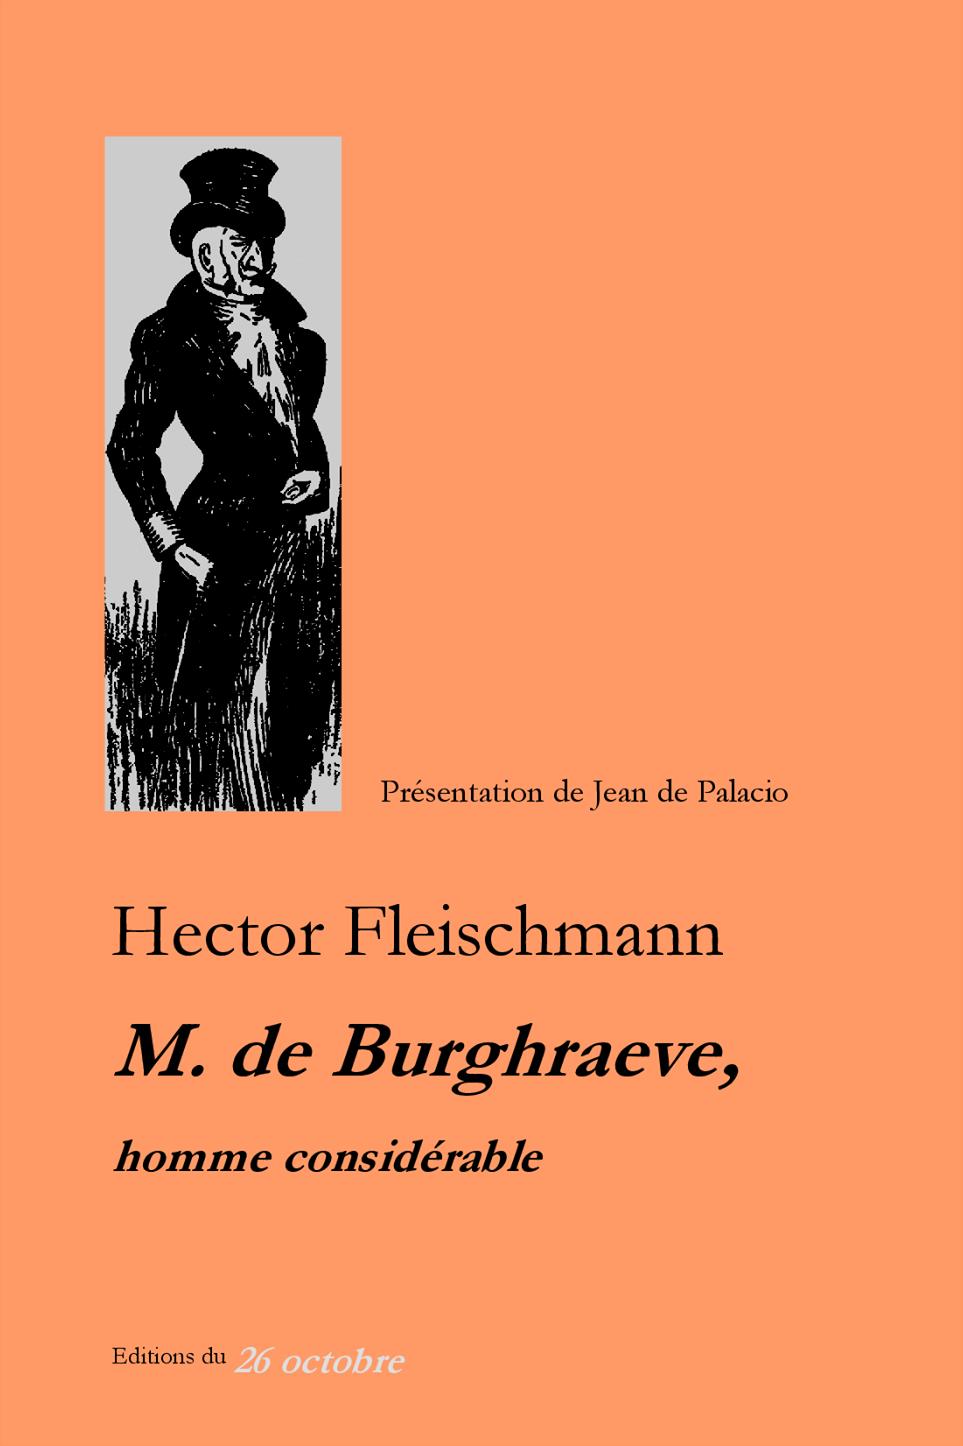 M. de Burghraeve, homme considérable de Hector Fleischmann.